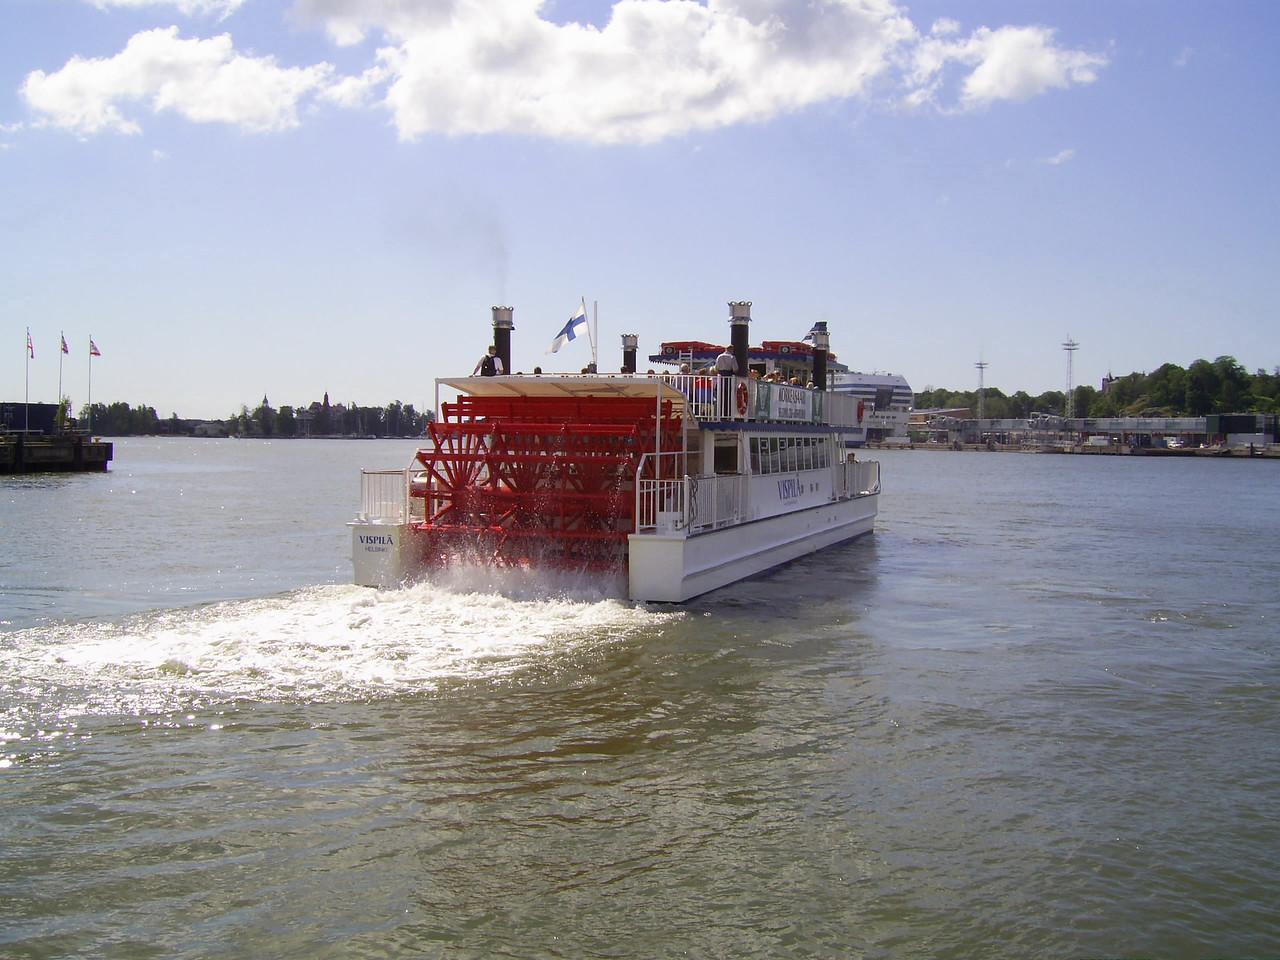 2007 - M/V VISPILÄ : service from Helsinki to Korkeasaari Zoo Island.